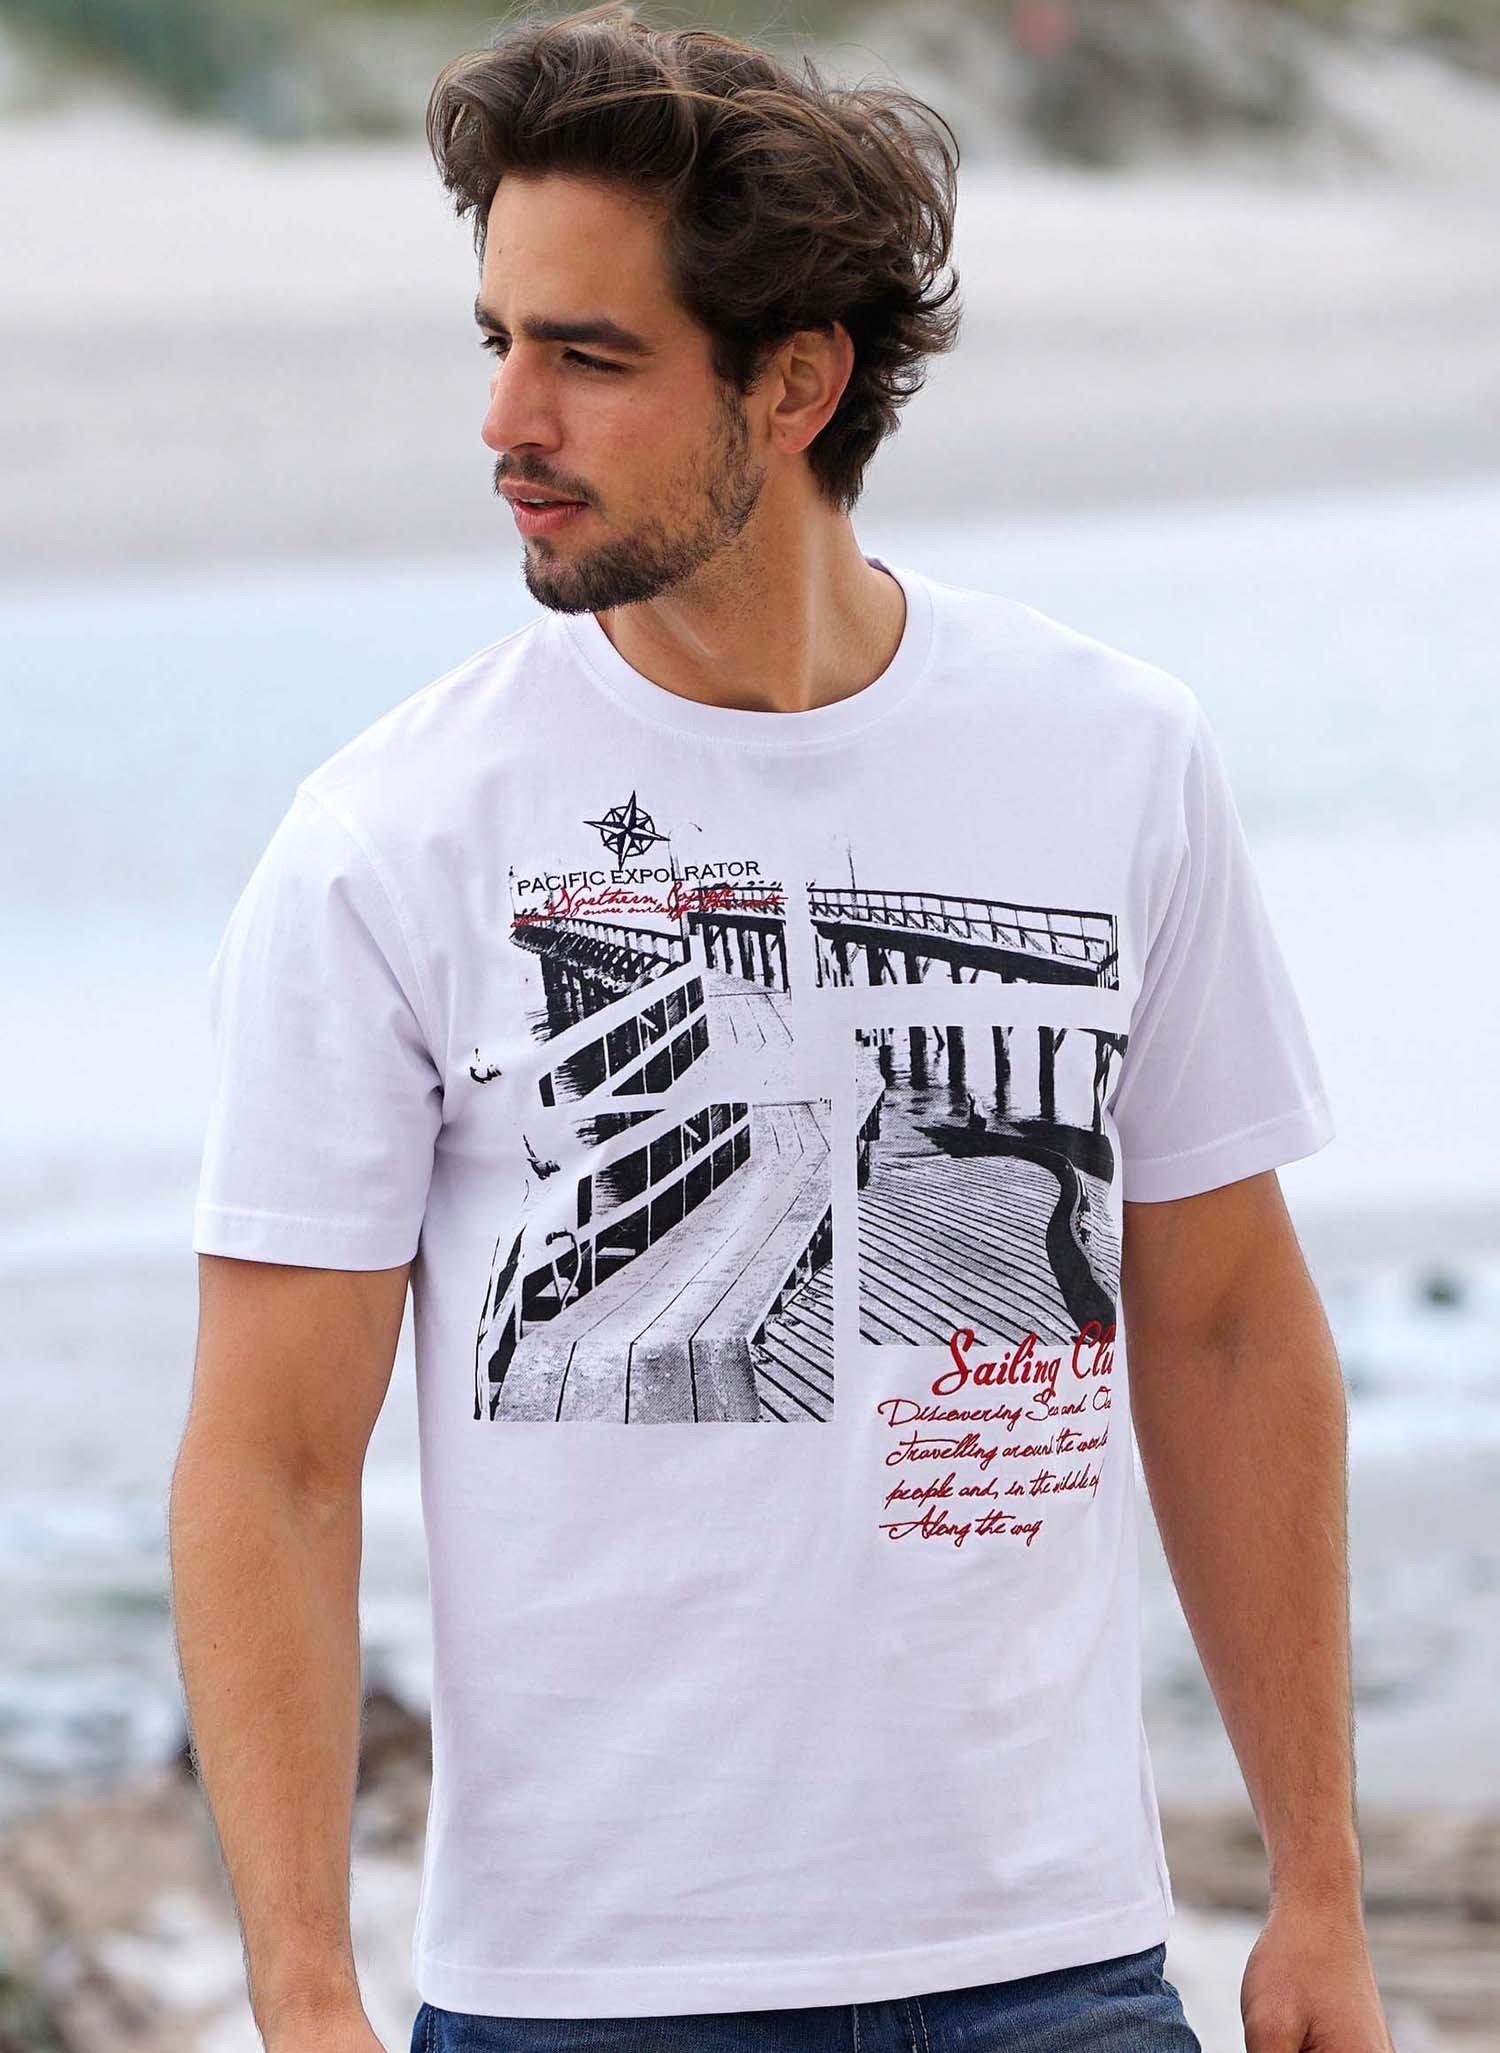 H-KA-Shirt,Fotoprint, weiss L 001 - 1 - Ronja.ch